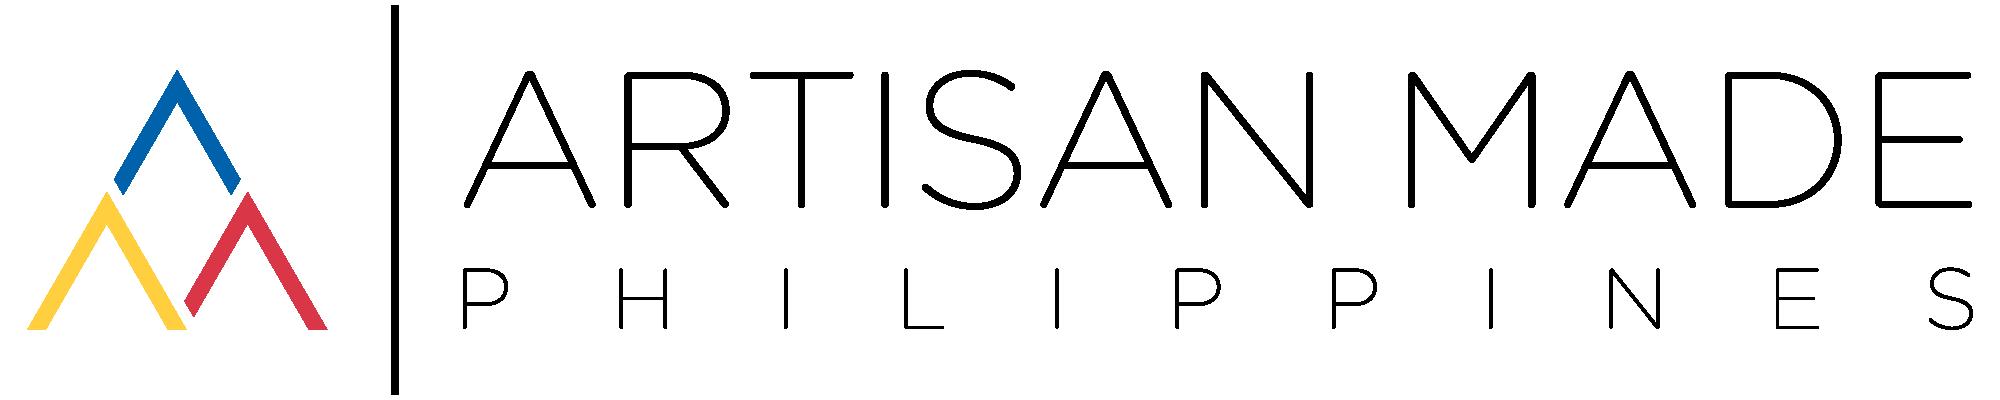 Artisan Made Philippines Logo